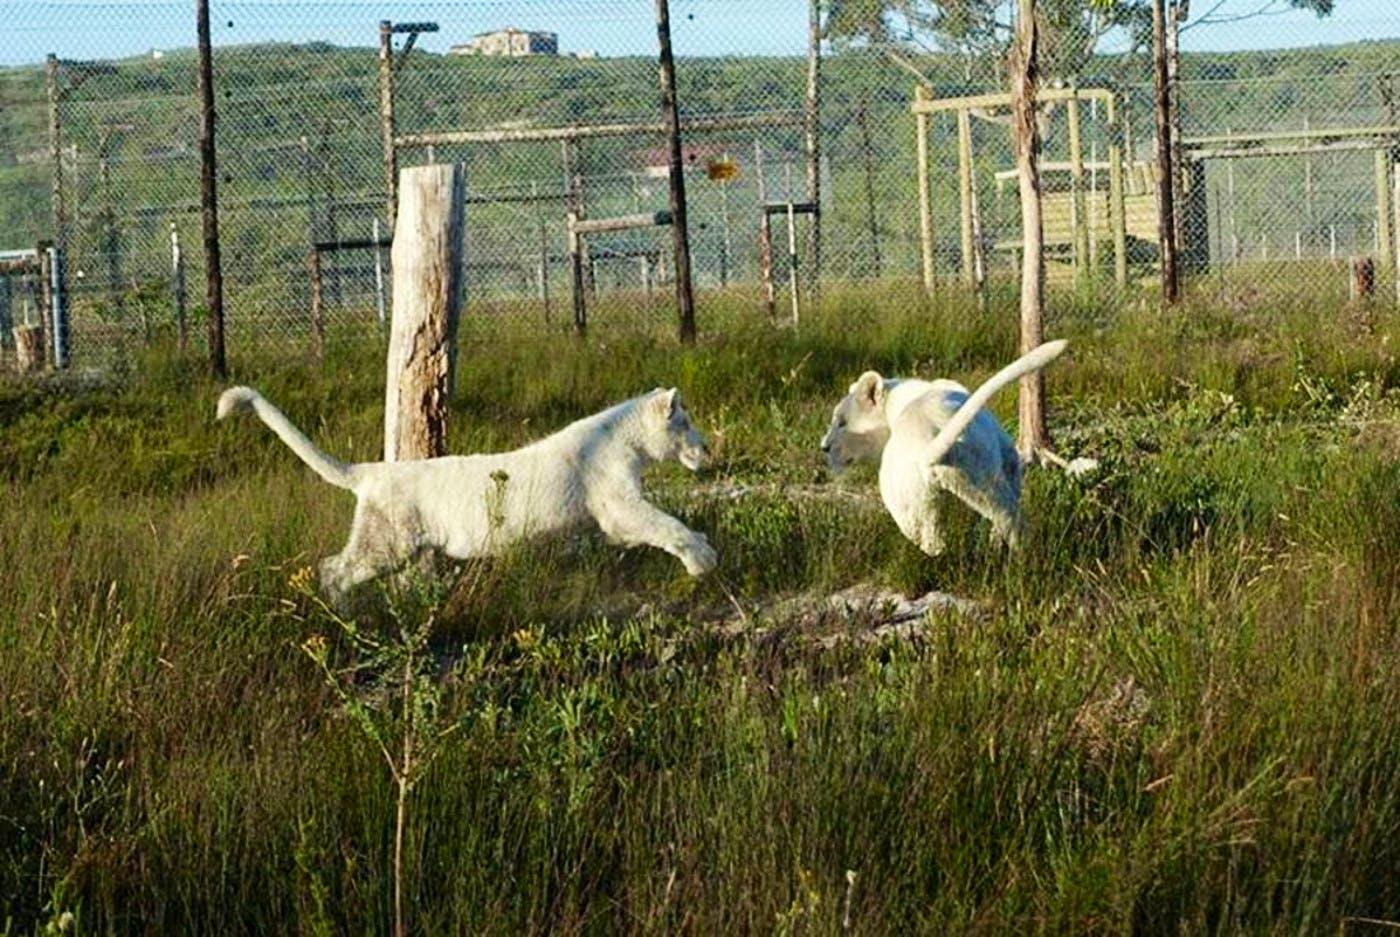 Western Cape Big Cat Sanctuary